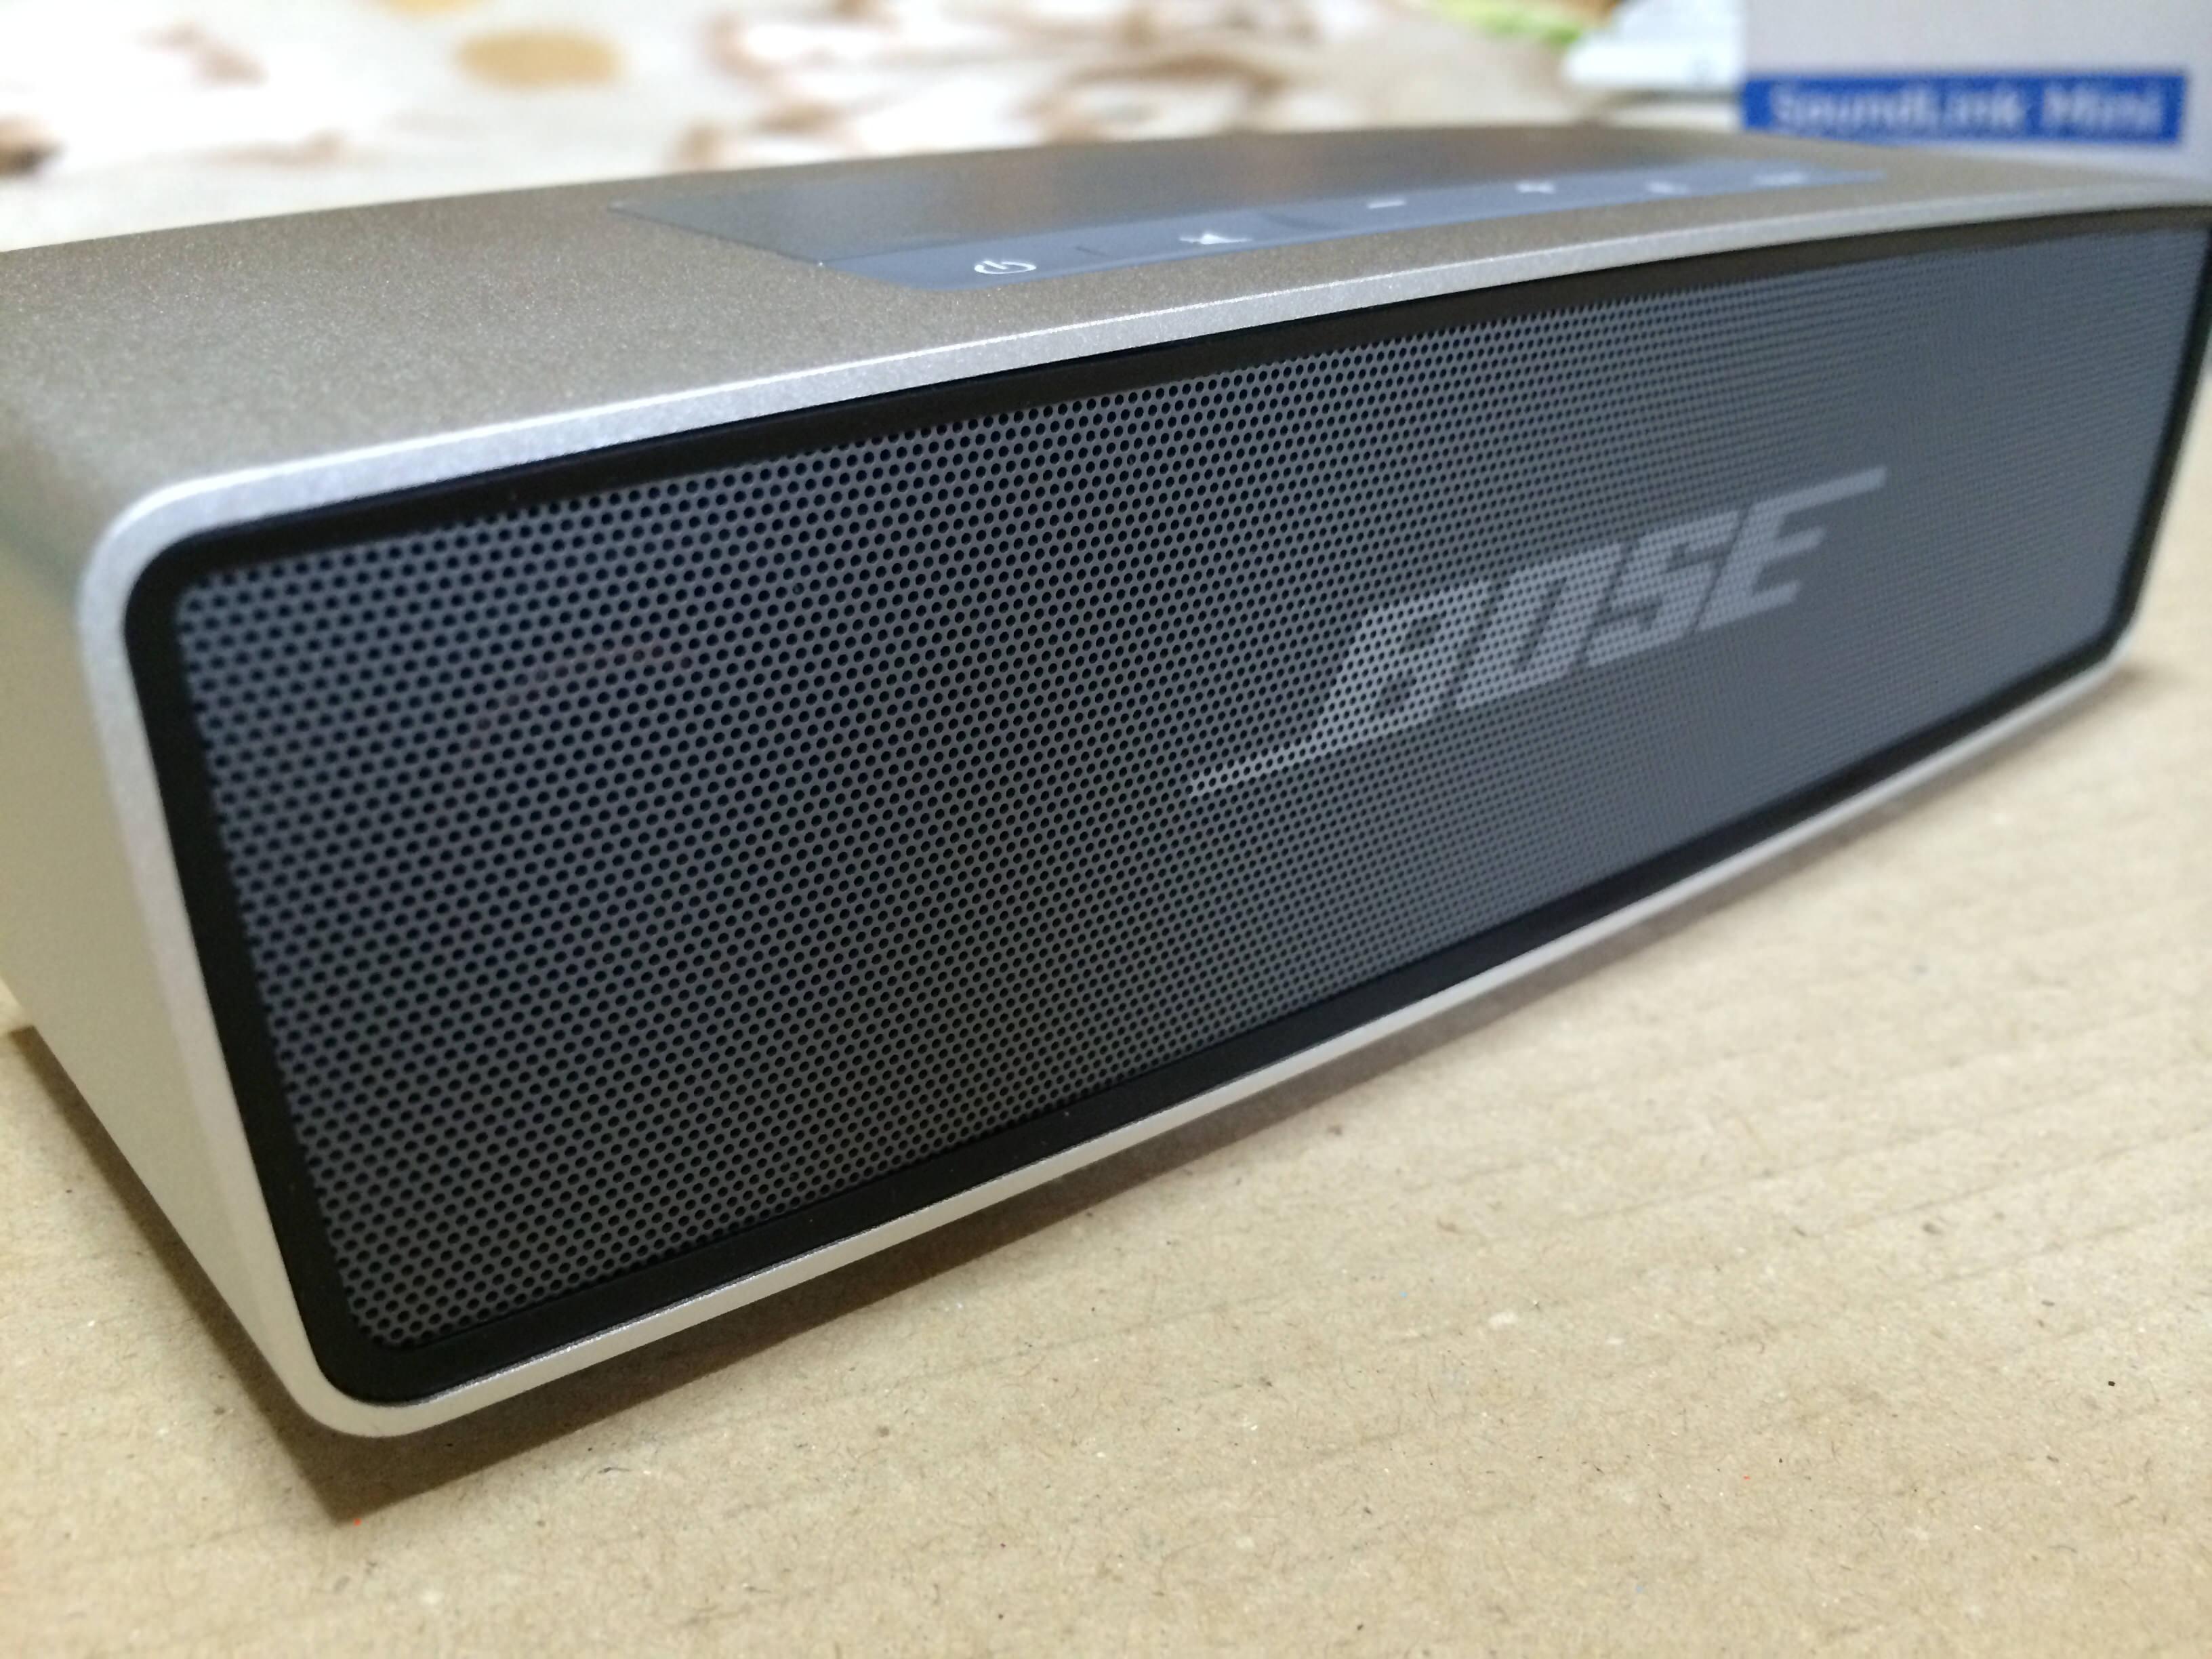 BOSE SoundLink mini Blutooth Speaker 本体